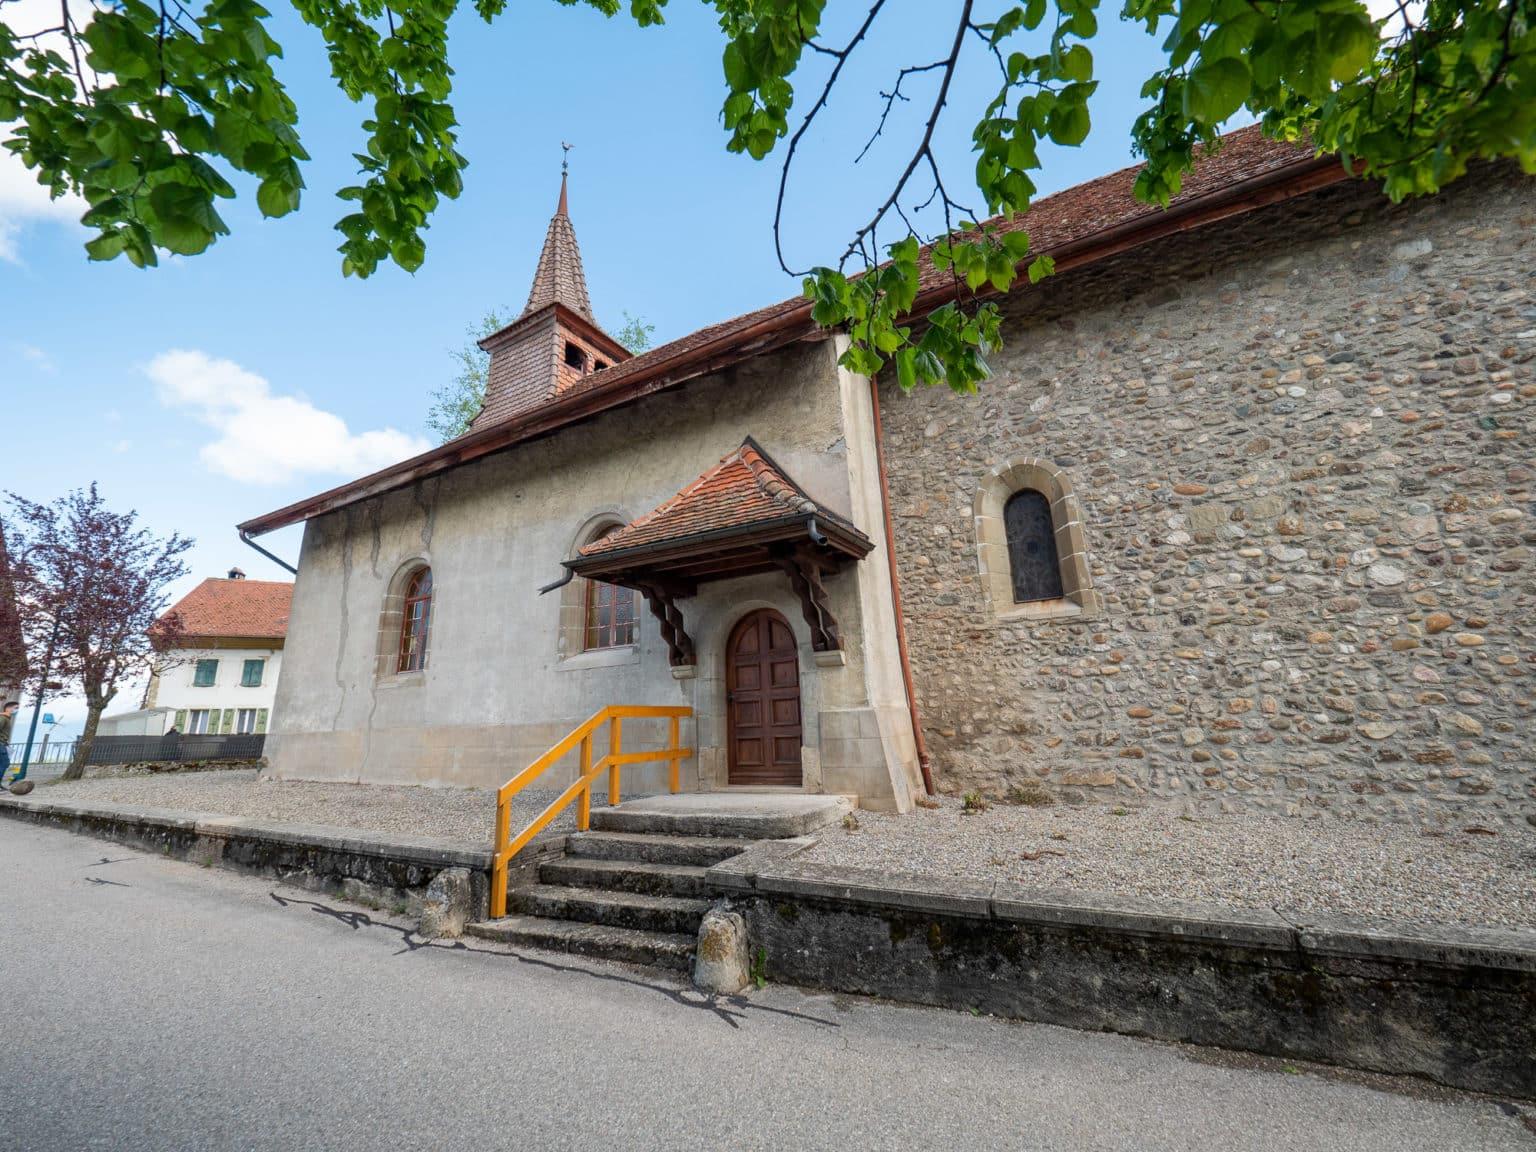 Refuges-salles-Montanaire©V-Dubach-52561